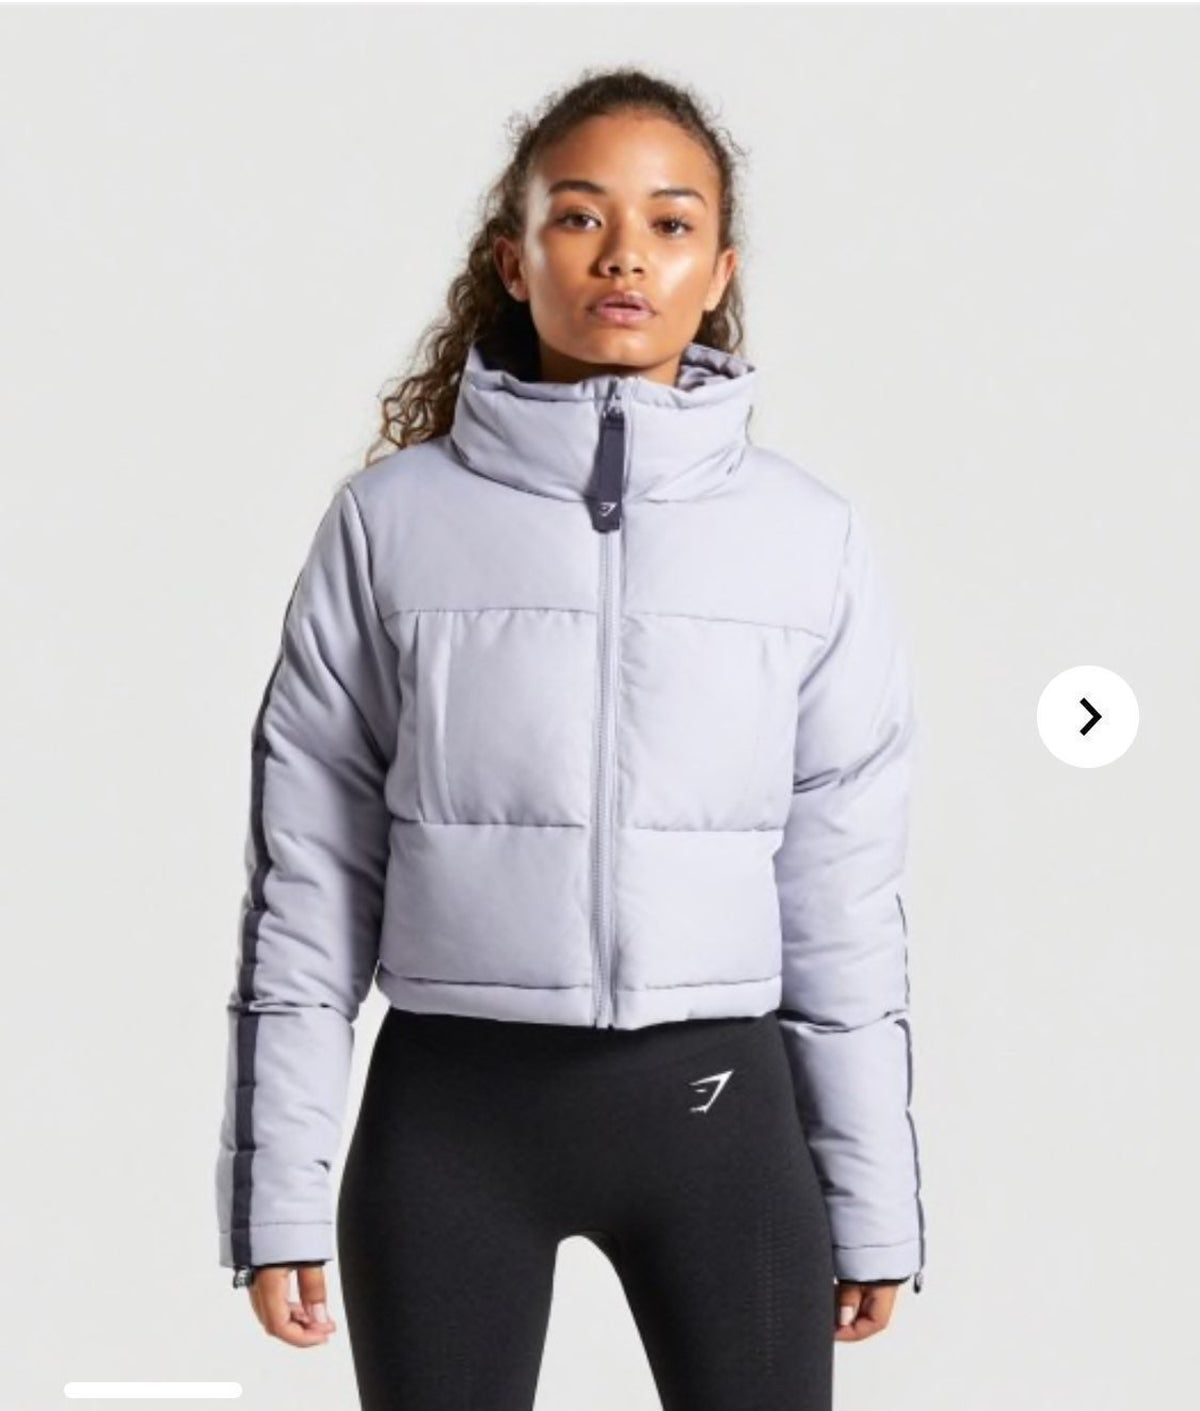 Gymshark Oversized Puffer Jacket On Mercari Oversized Puffer Jacket Puffer Jackets Grey Puffer Jacket [ 1411 x 1200 Pixel ]